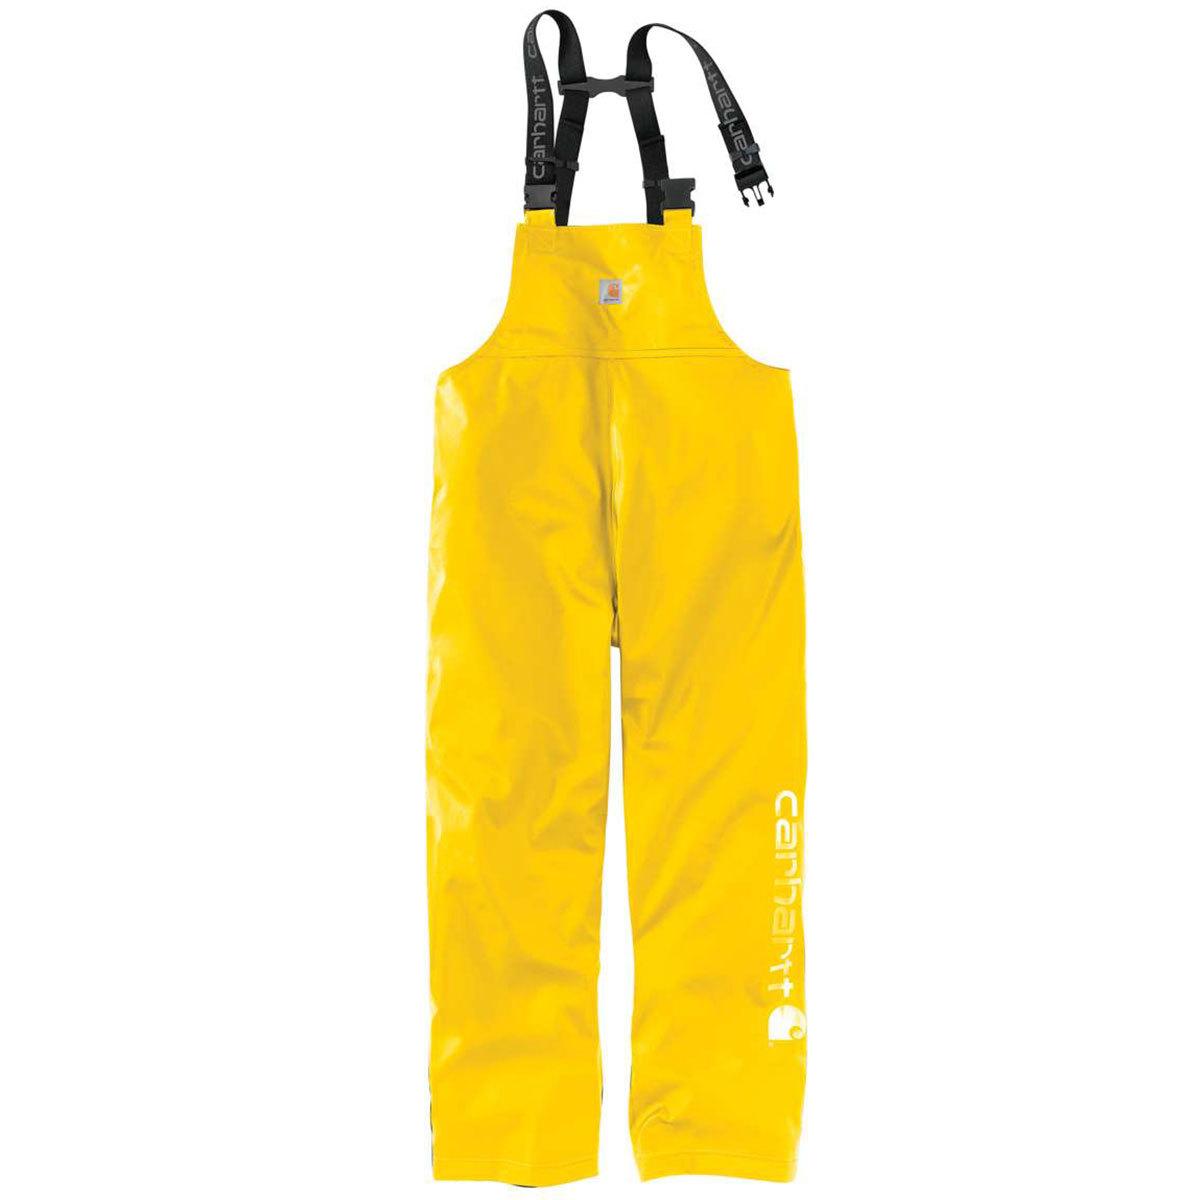 Carhartt Men's Lightweight Waterproof Rainstorm Bib Overalls - Yellow, XL